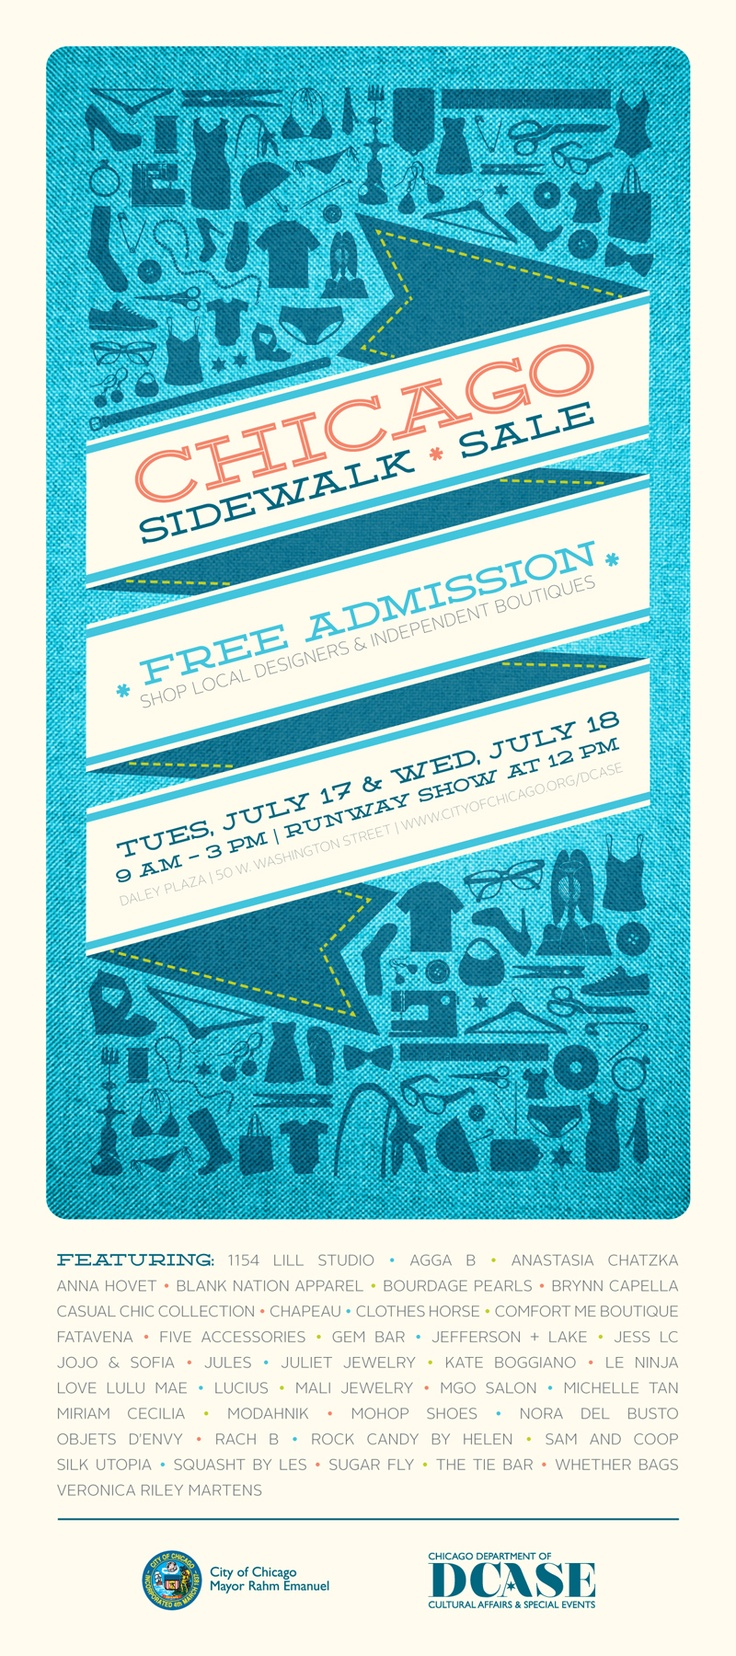 Chicago Sidewalk Sale: Ship Special, Sidewalk Sales, Chicago Sidewalk, Cruise Ships, Signage Idea